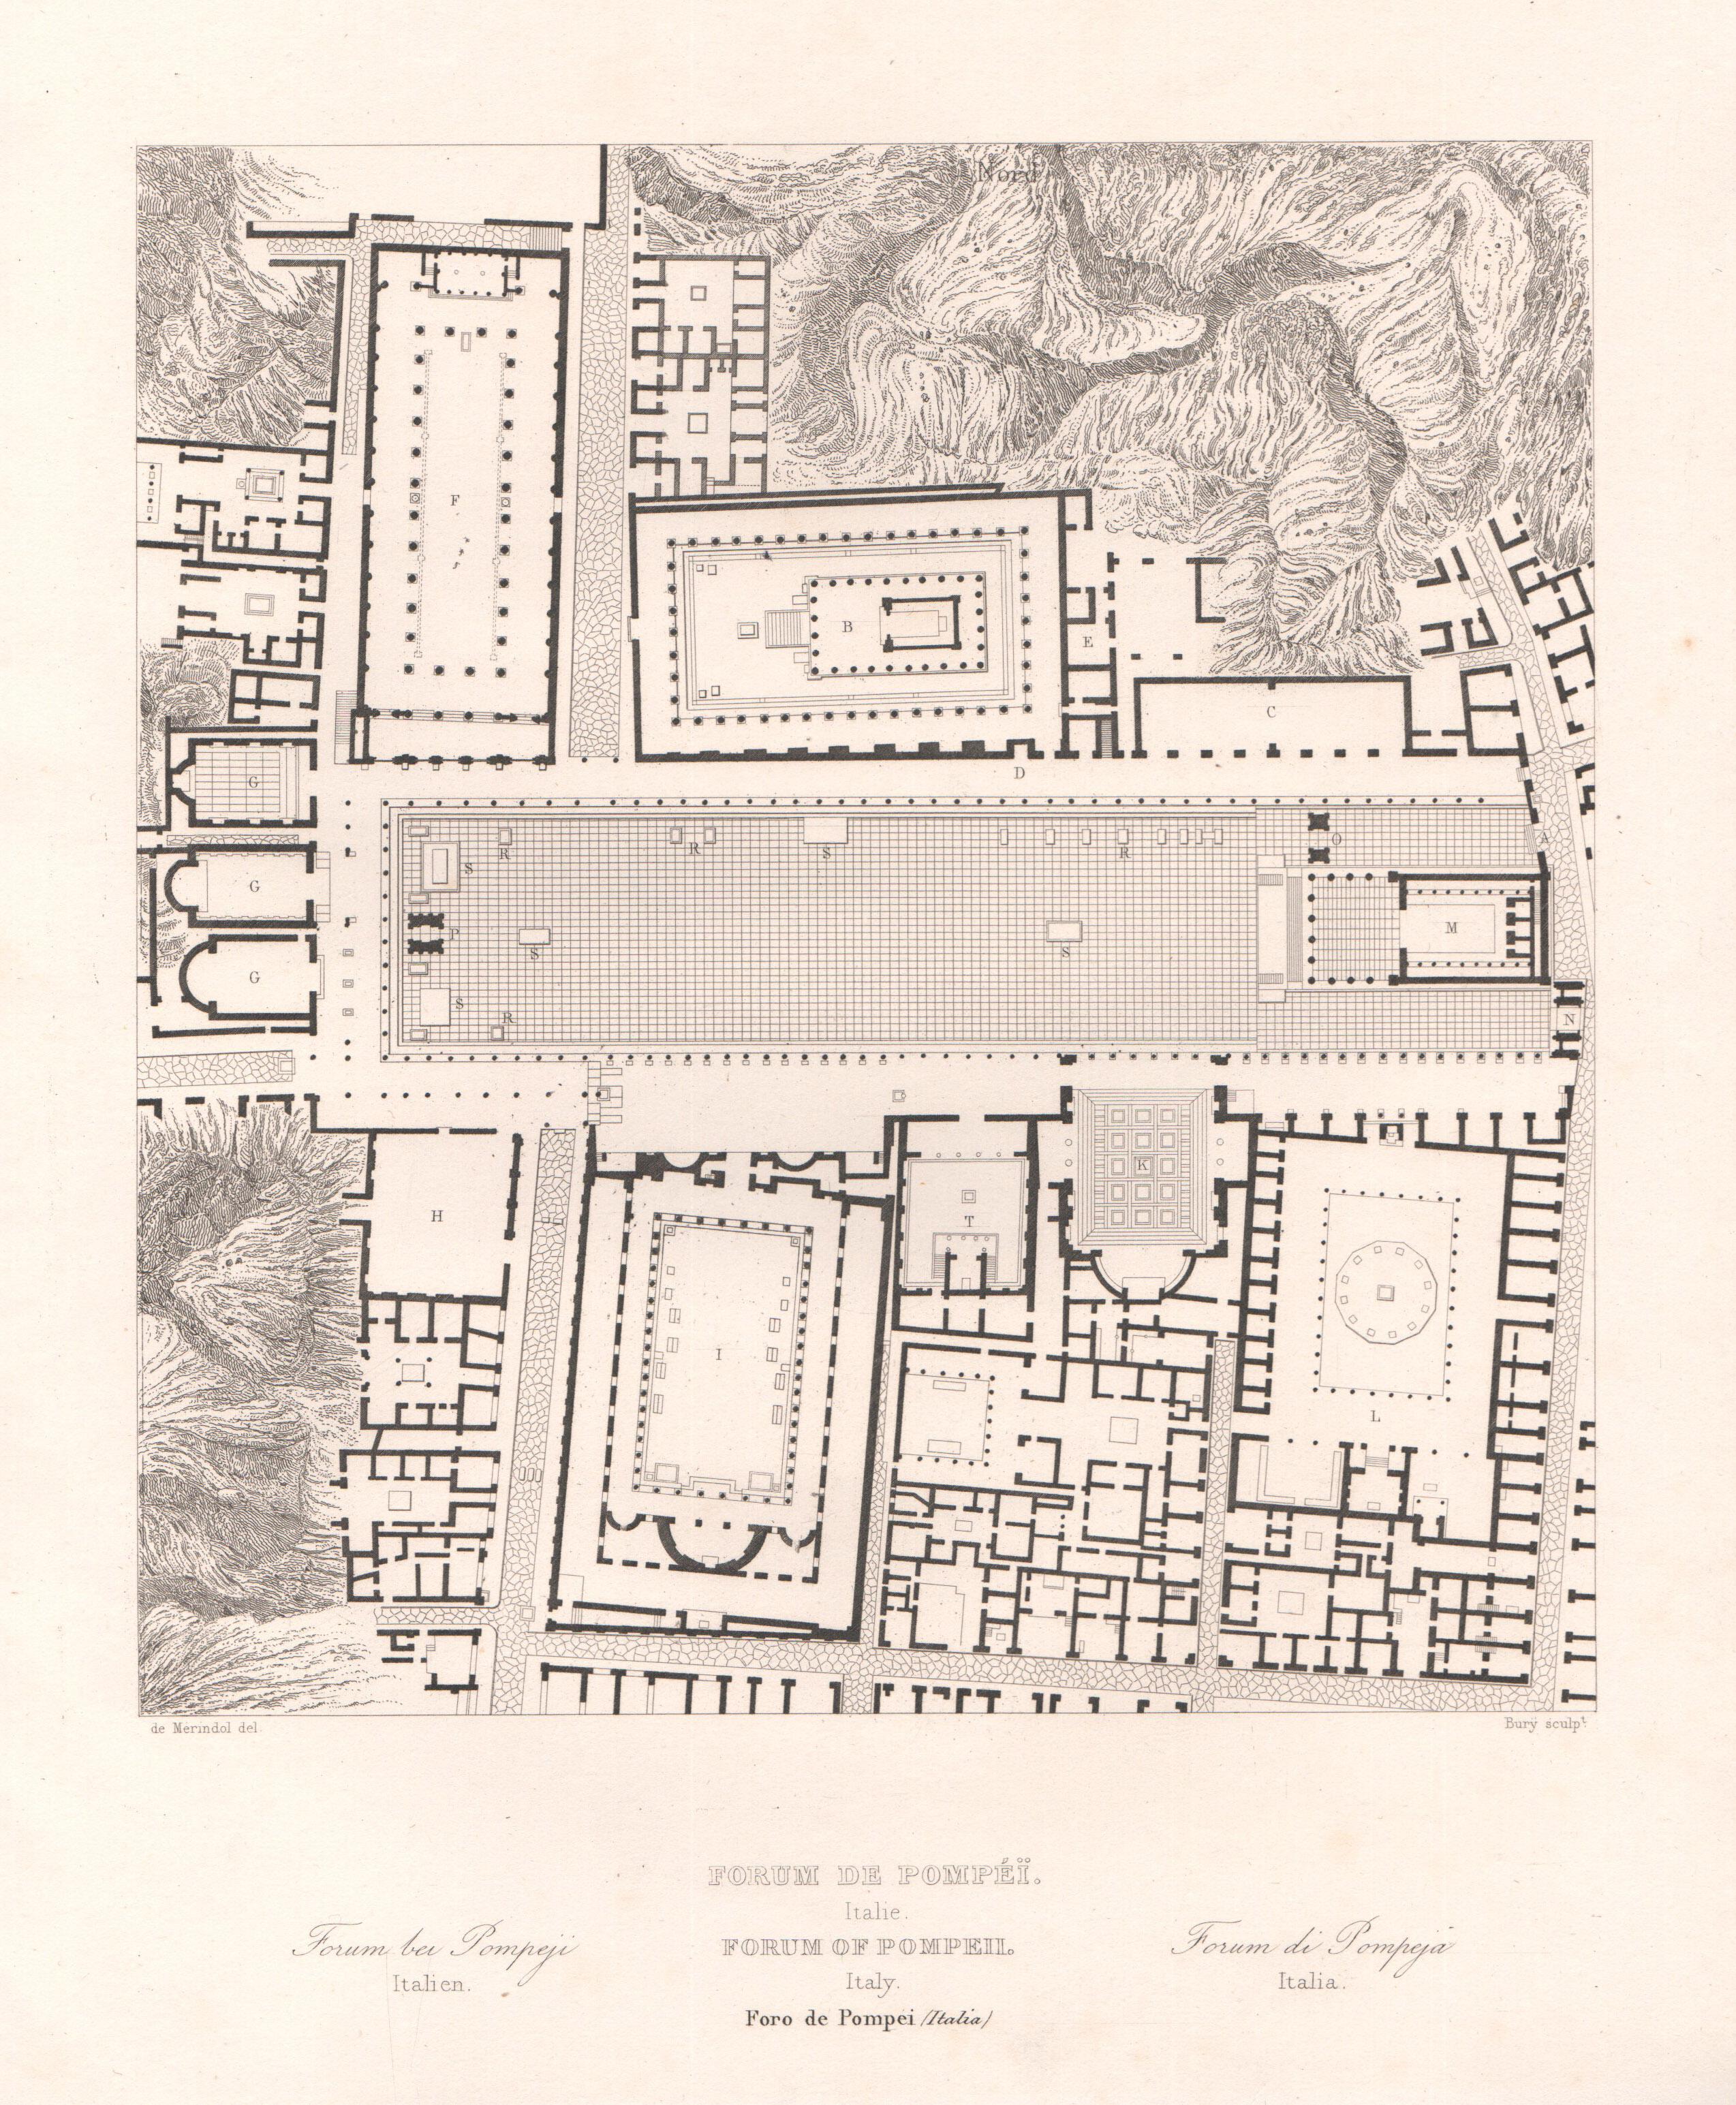 Italy - Antique Monuments - Forum of Pompei - Campania - Naples